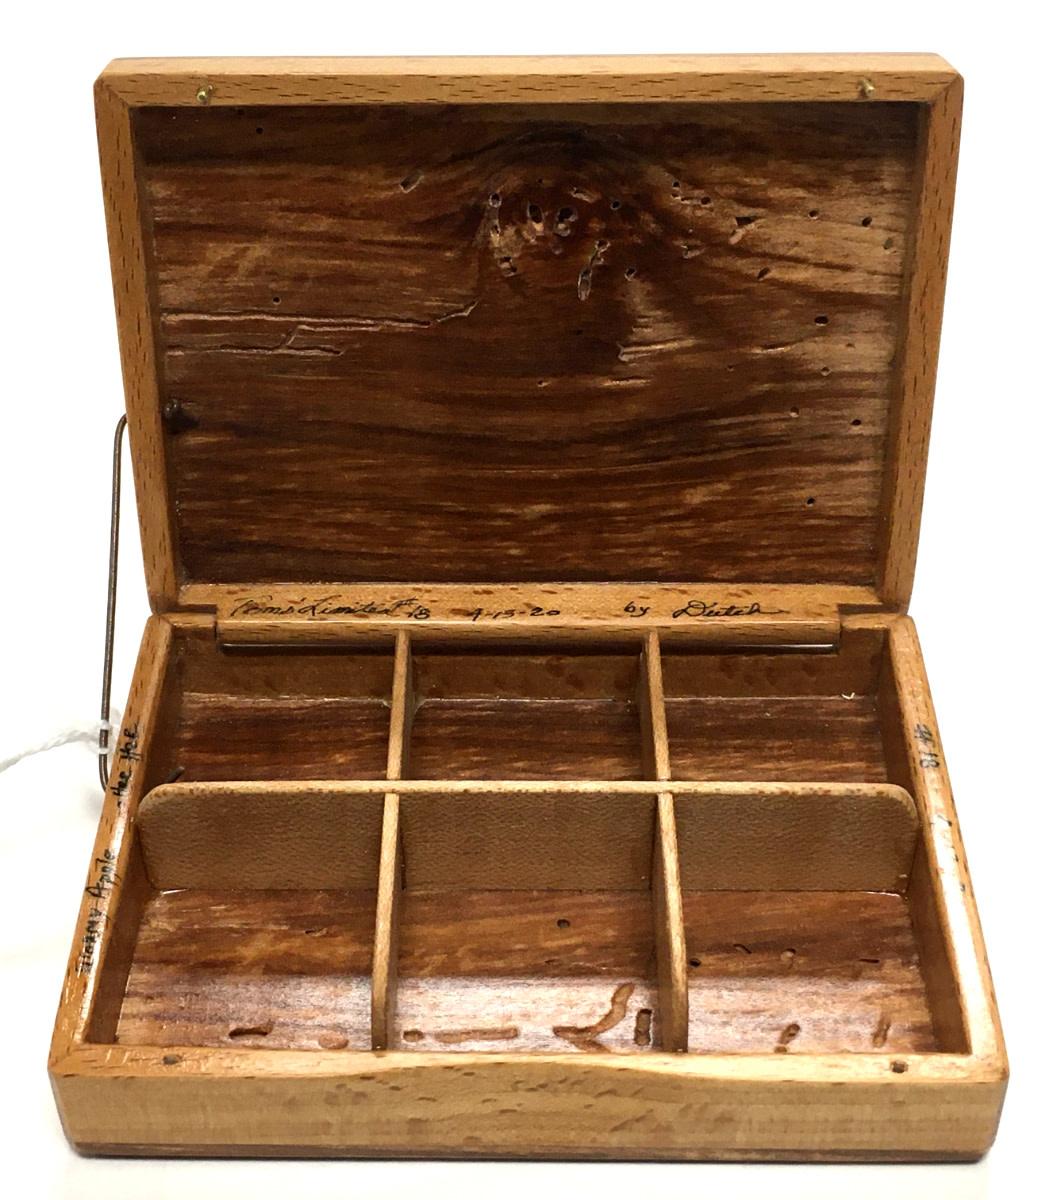 Dutch Box - Tom's Limited #18 - Wormy Apple